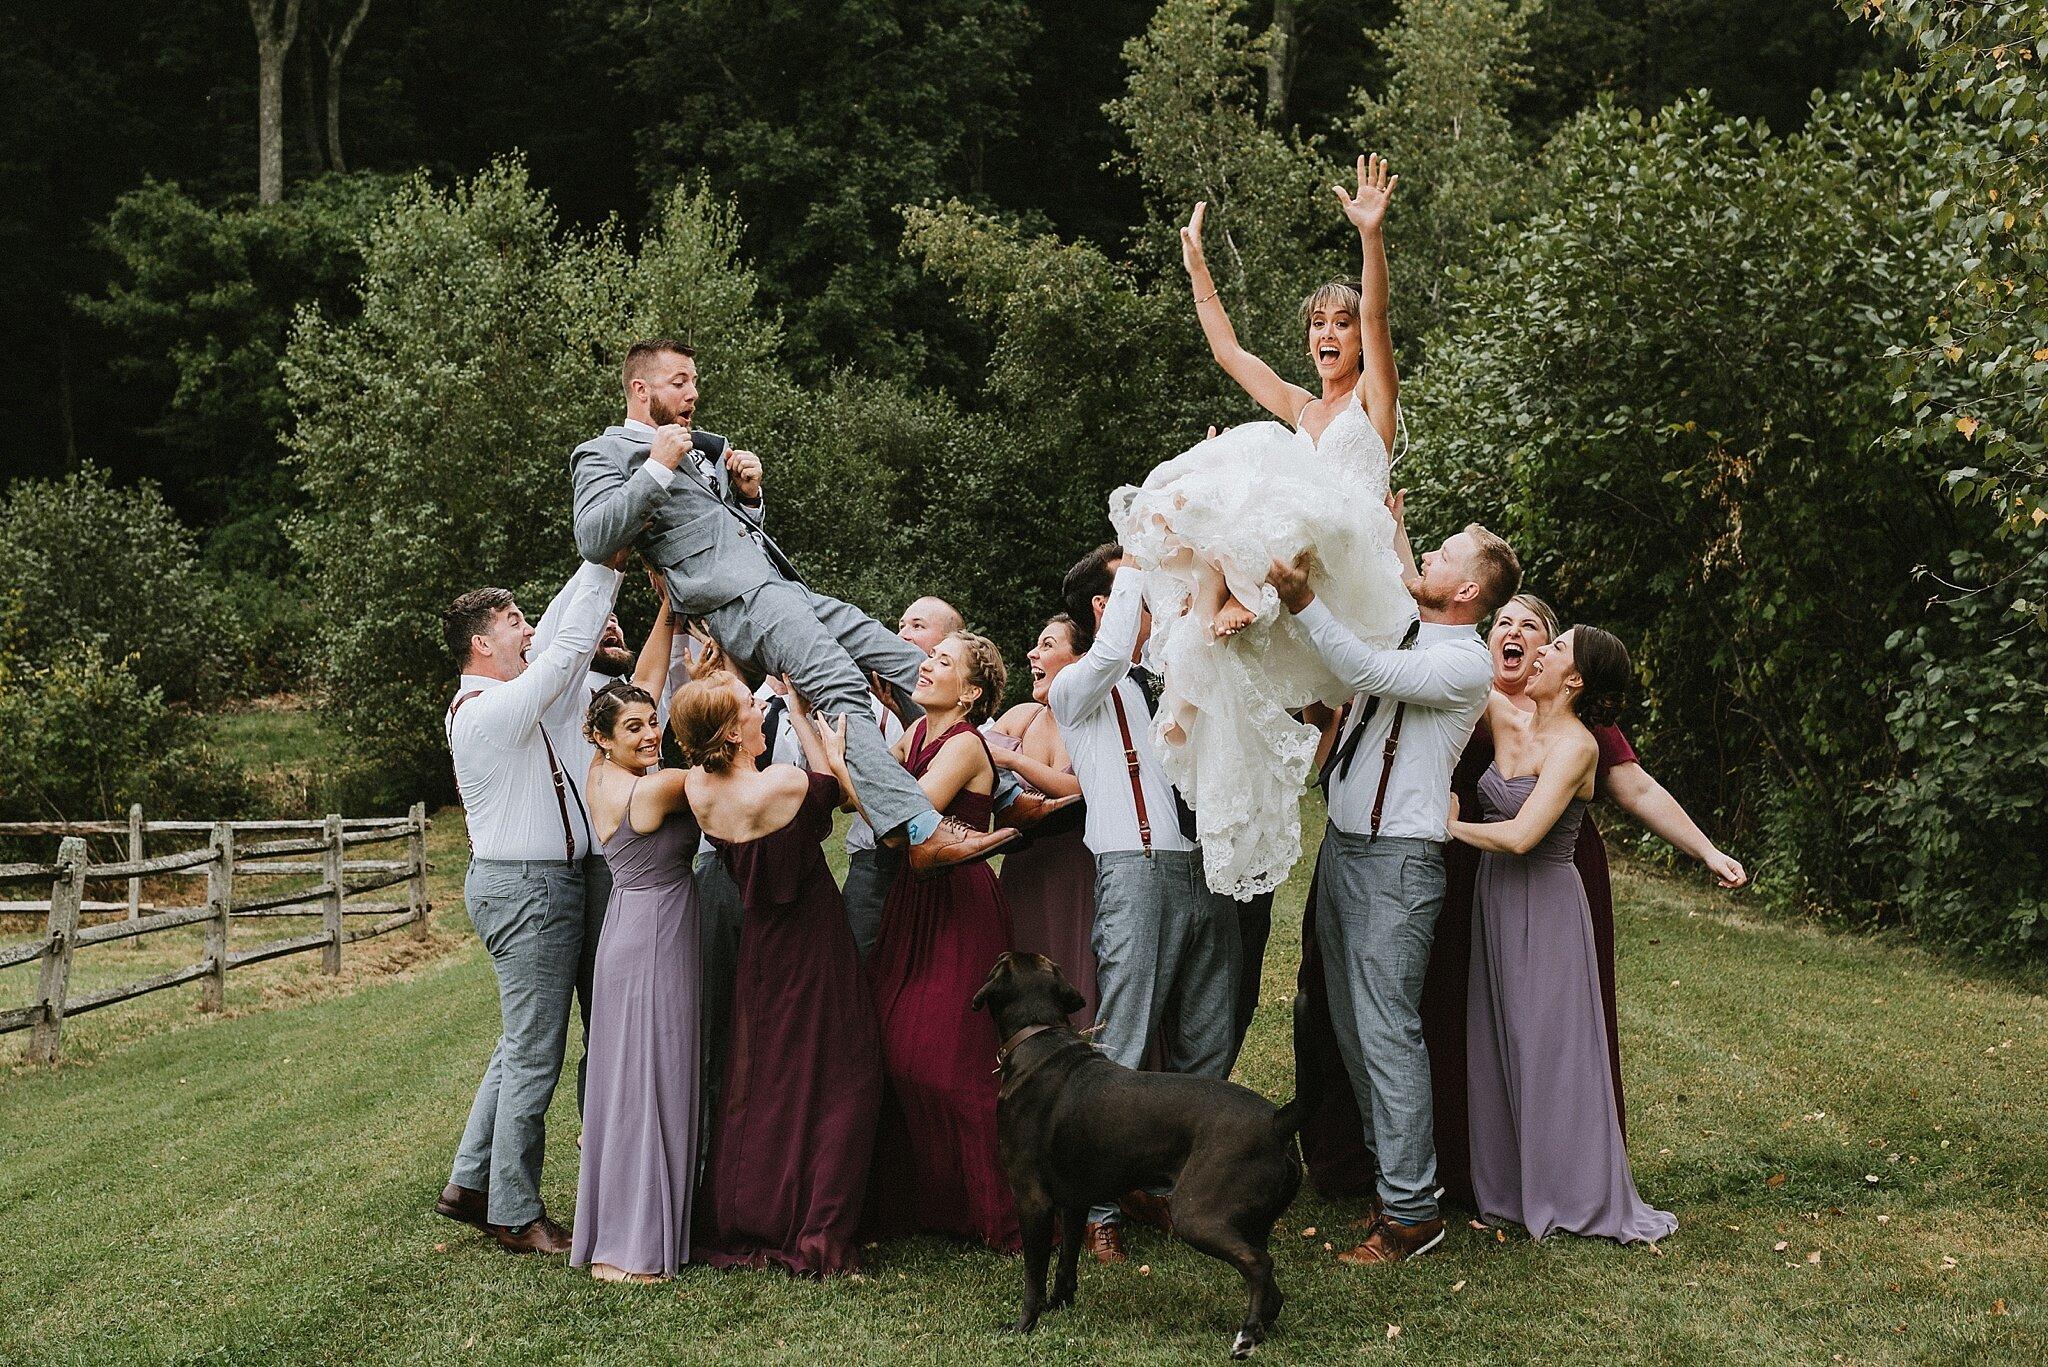 connecticut_wedding_3032.jpg